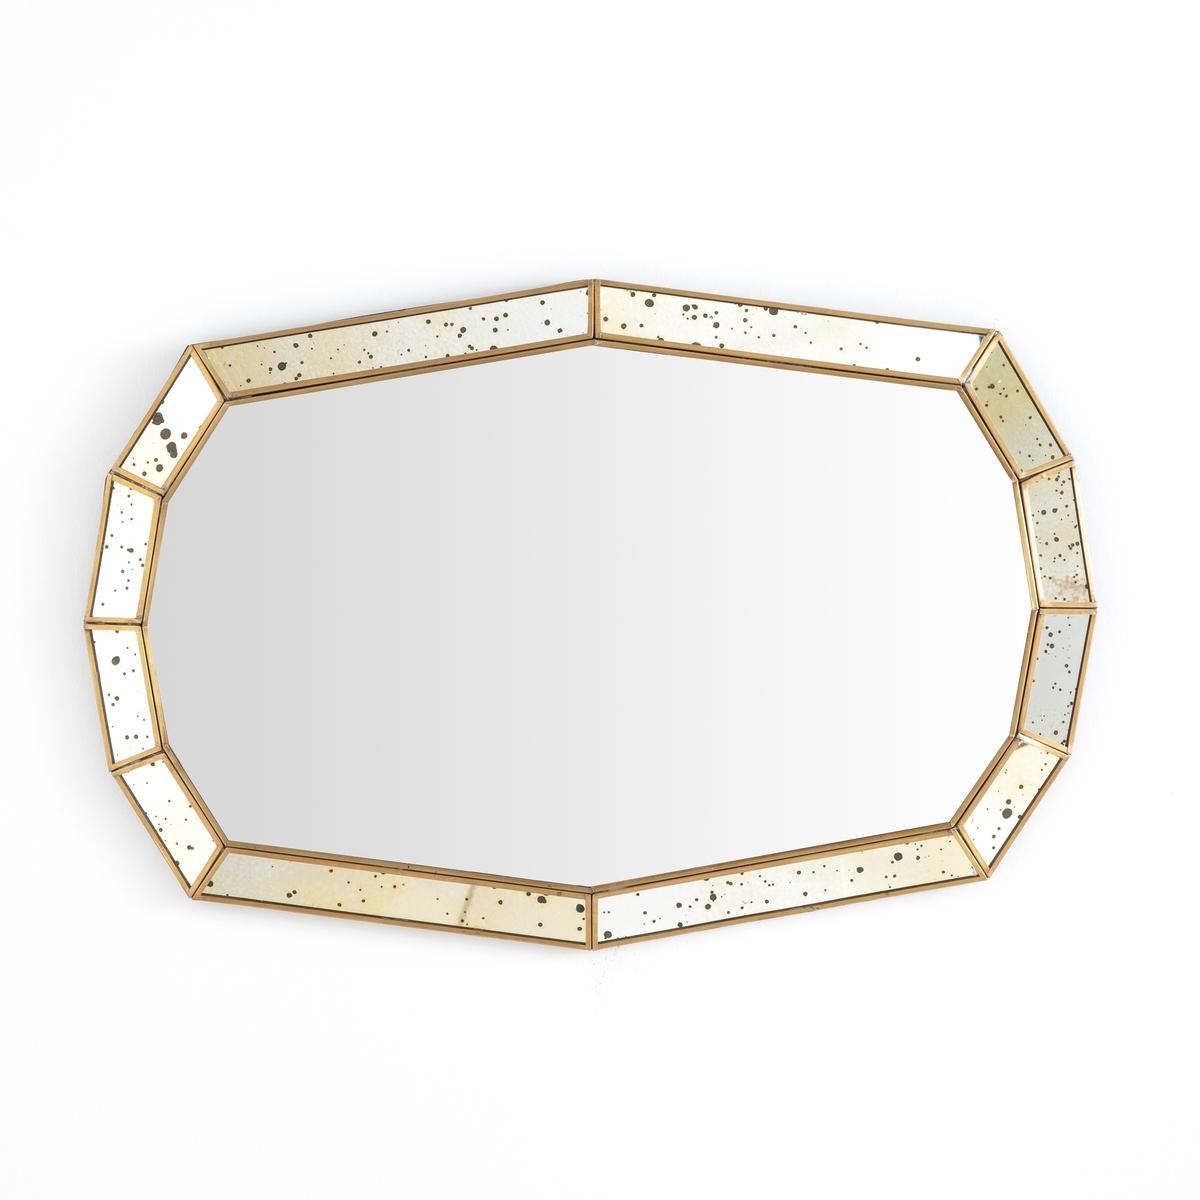 Зеркало, В.60 см la maison blanche la nuitрепродукции ван гога 75 x 30см